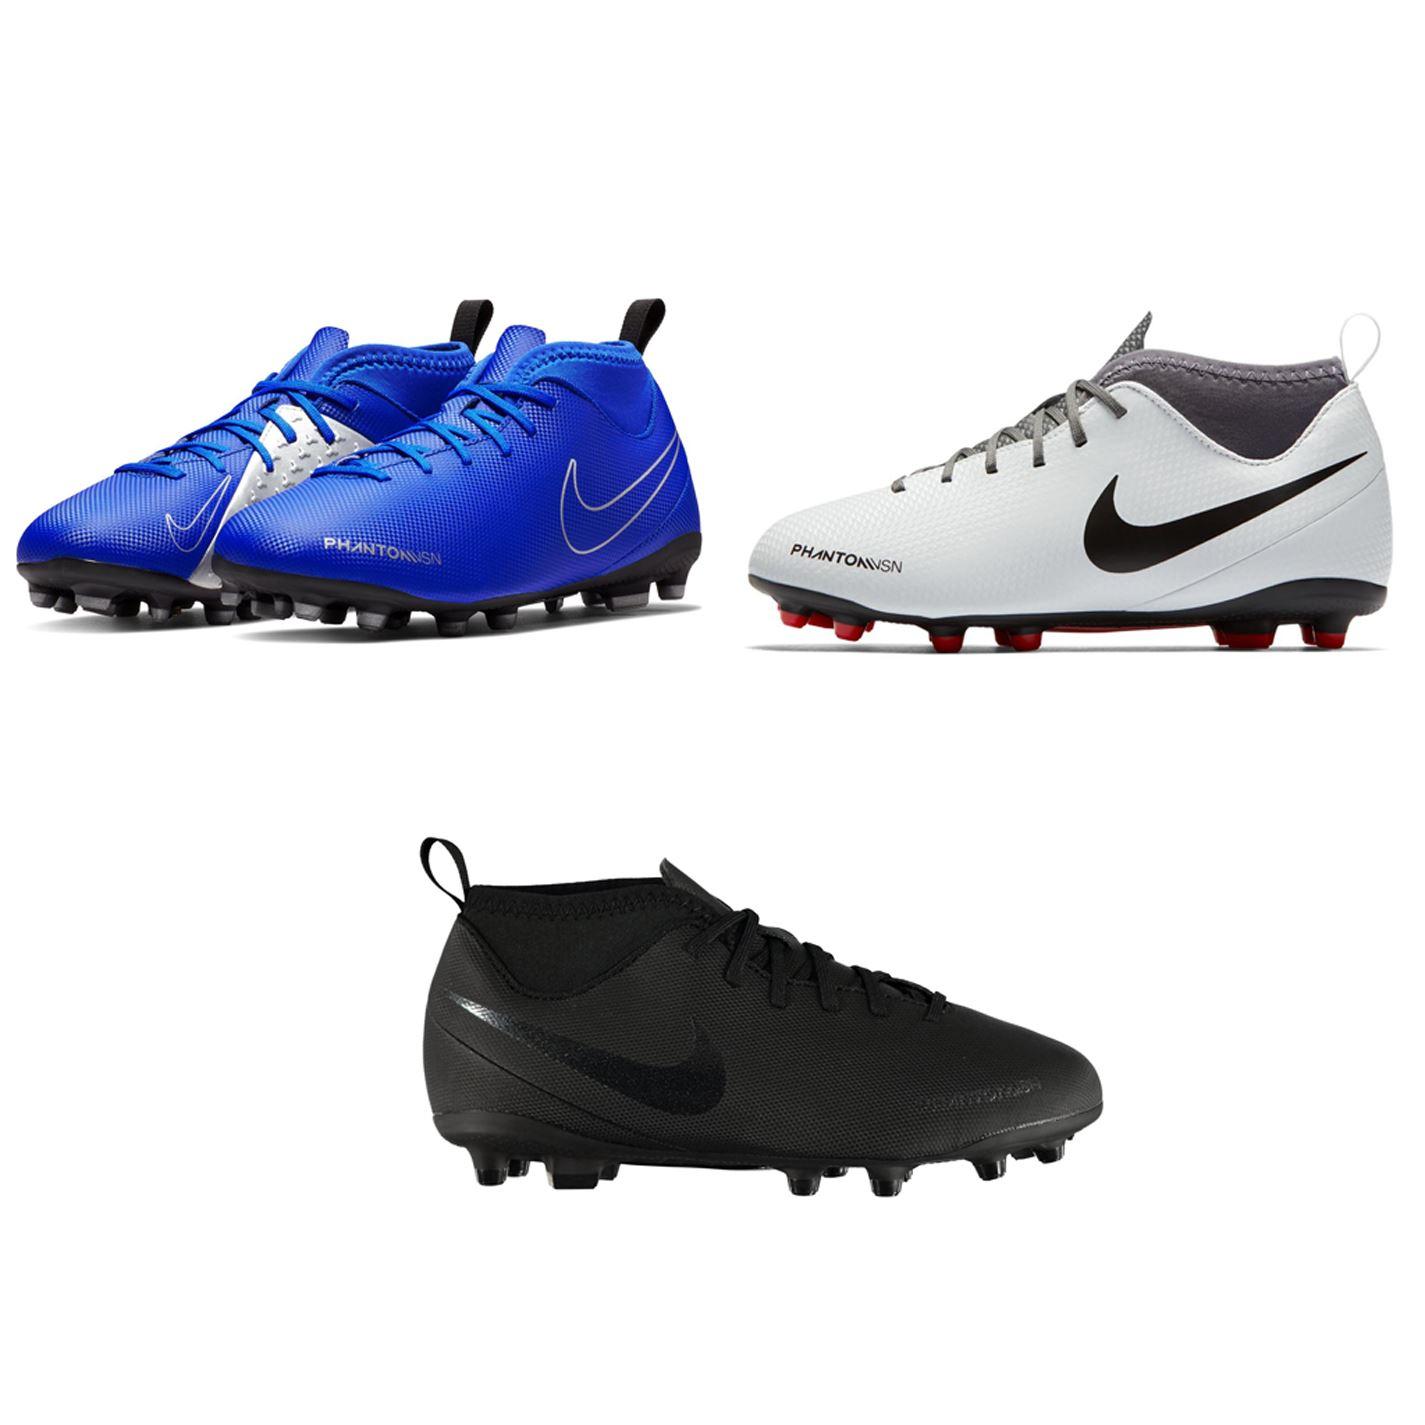 54b42ff52ee ... Nike Phantom Vision Club DF FG Firm Ground Football Boots Juniors  Soccer Cleats ...